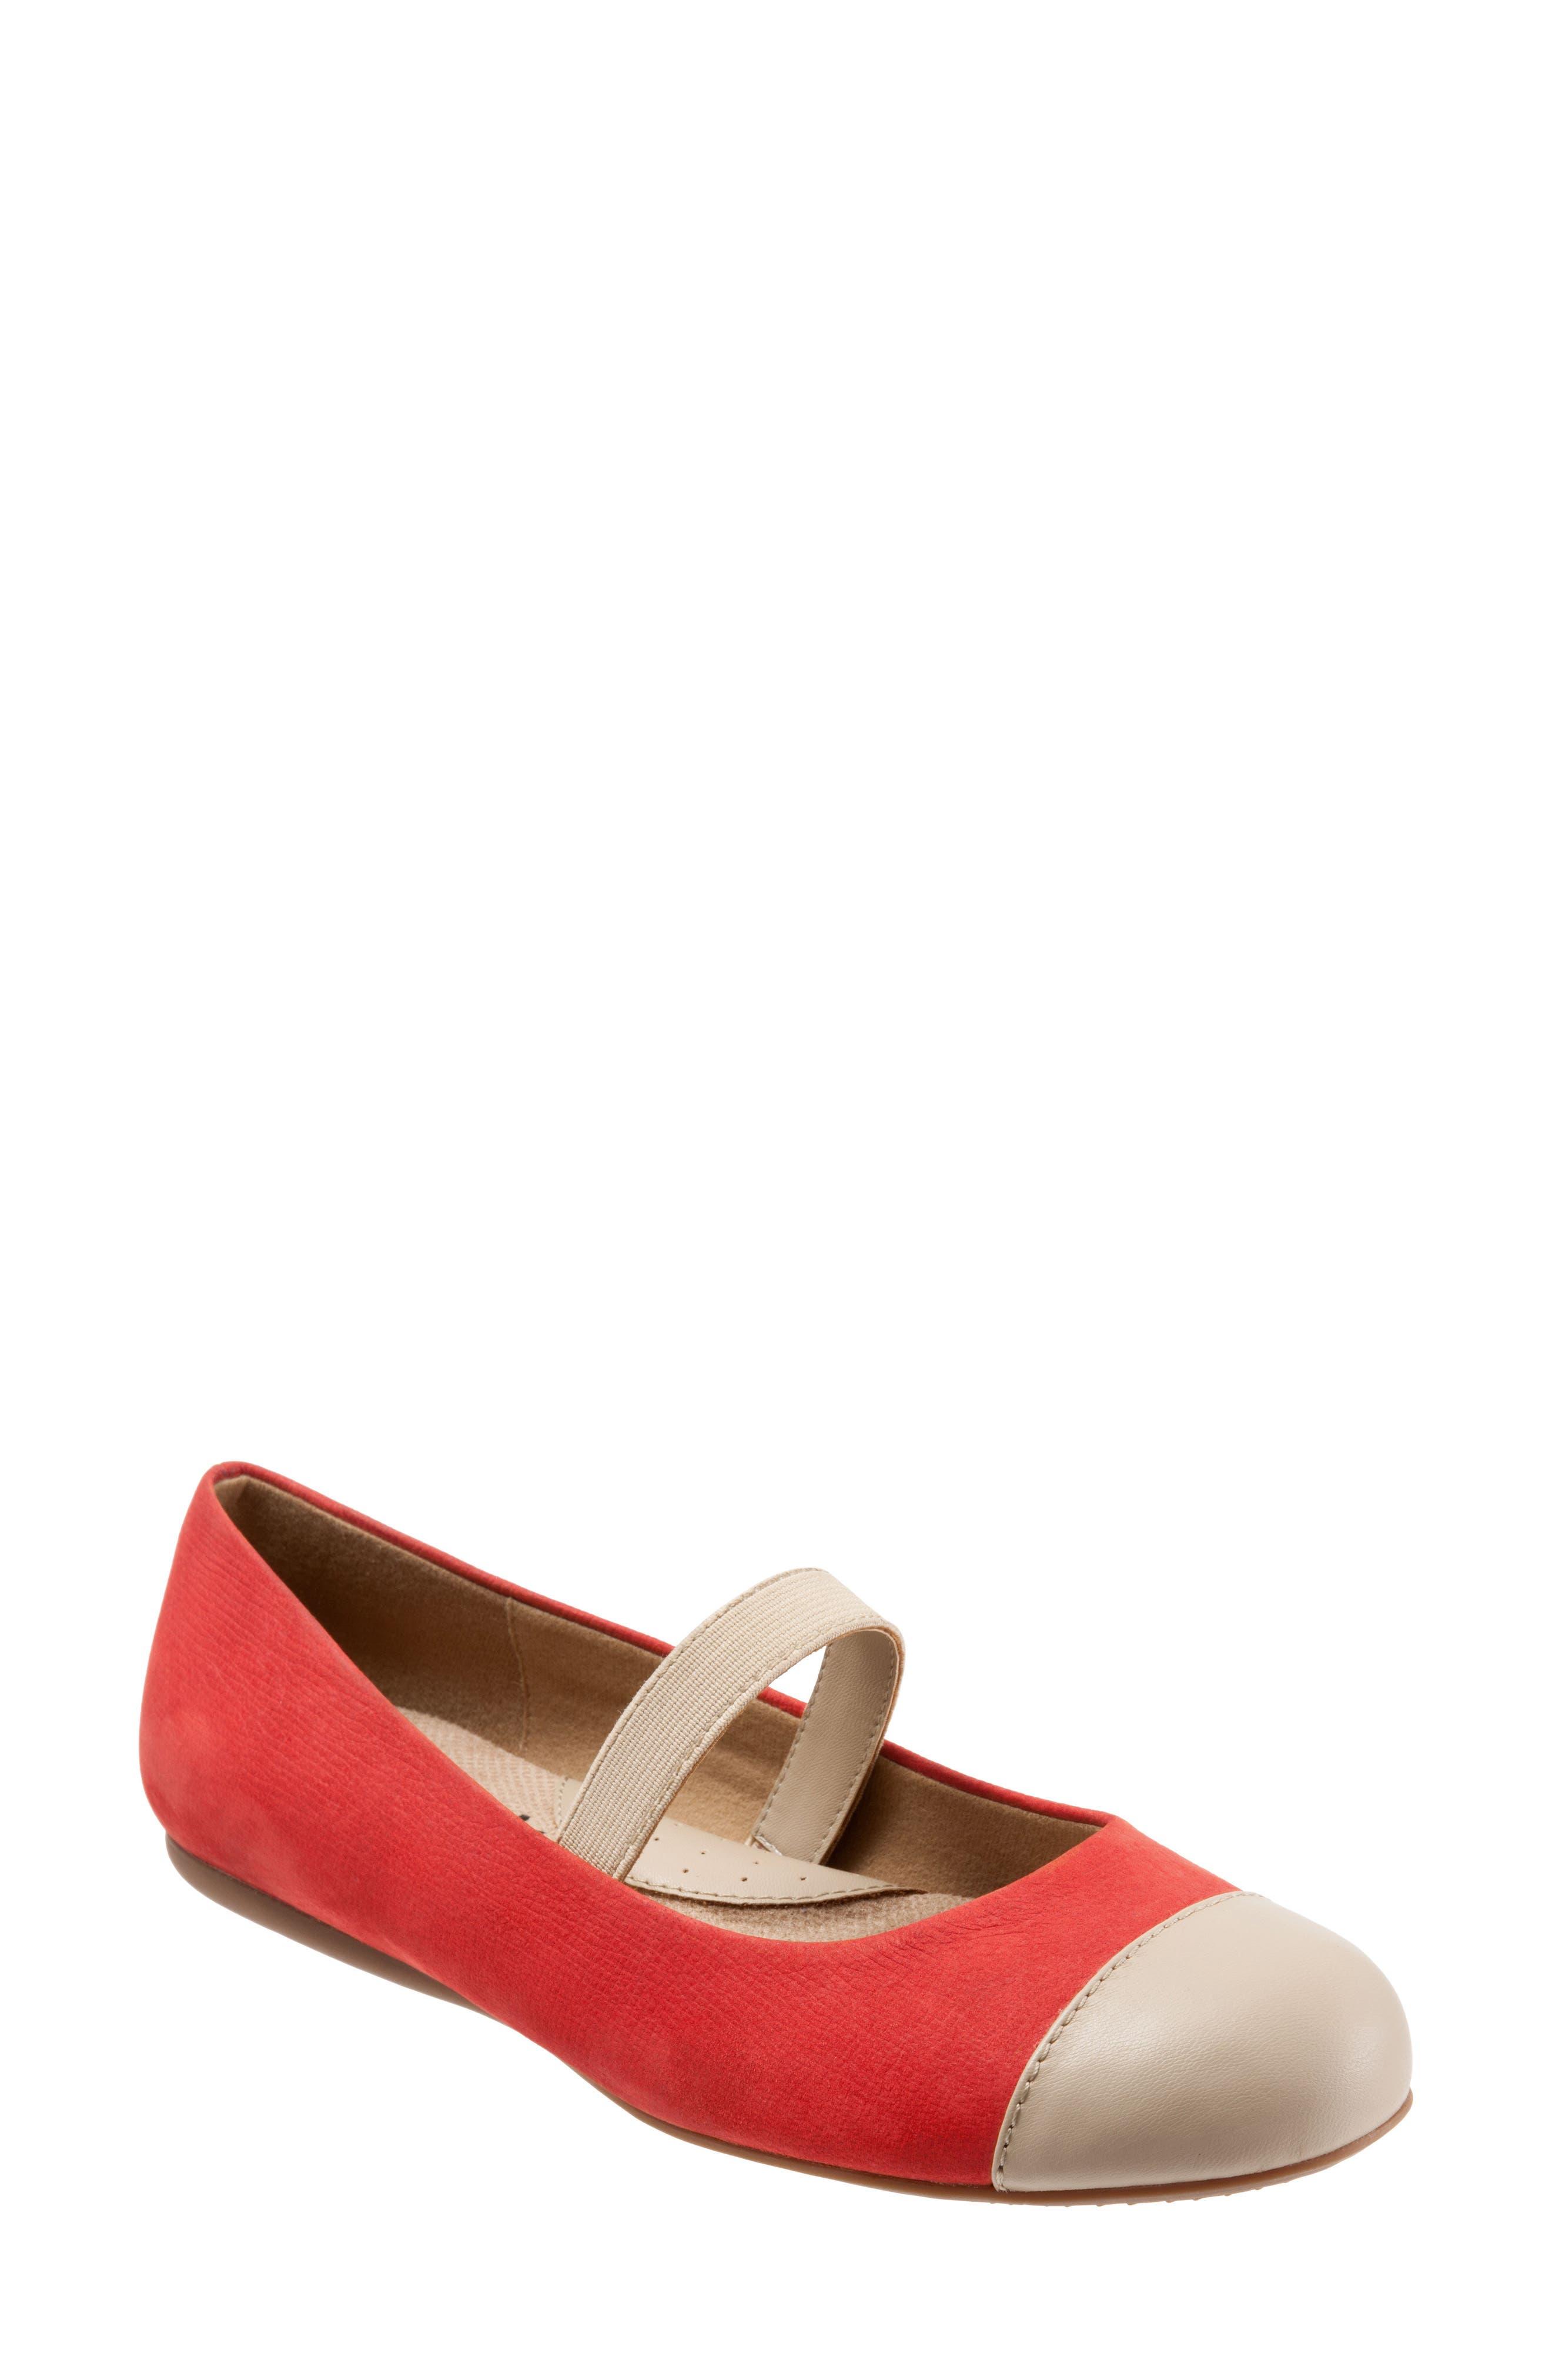 Softwalk Napa Mary Jane Flat, Red